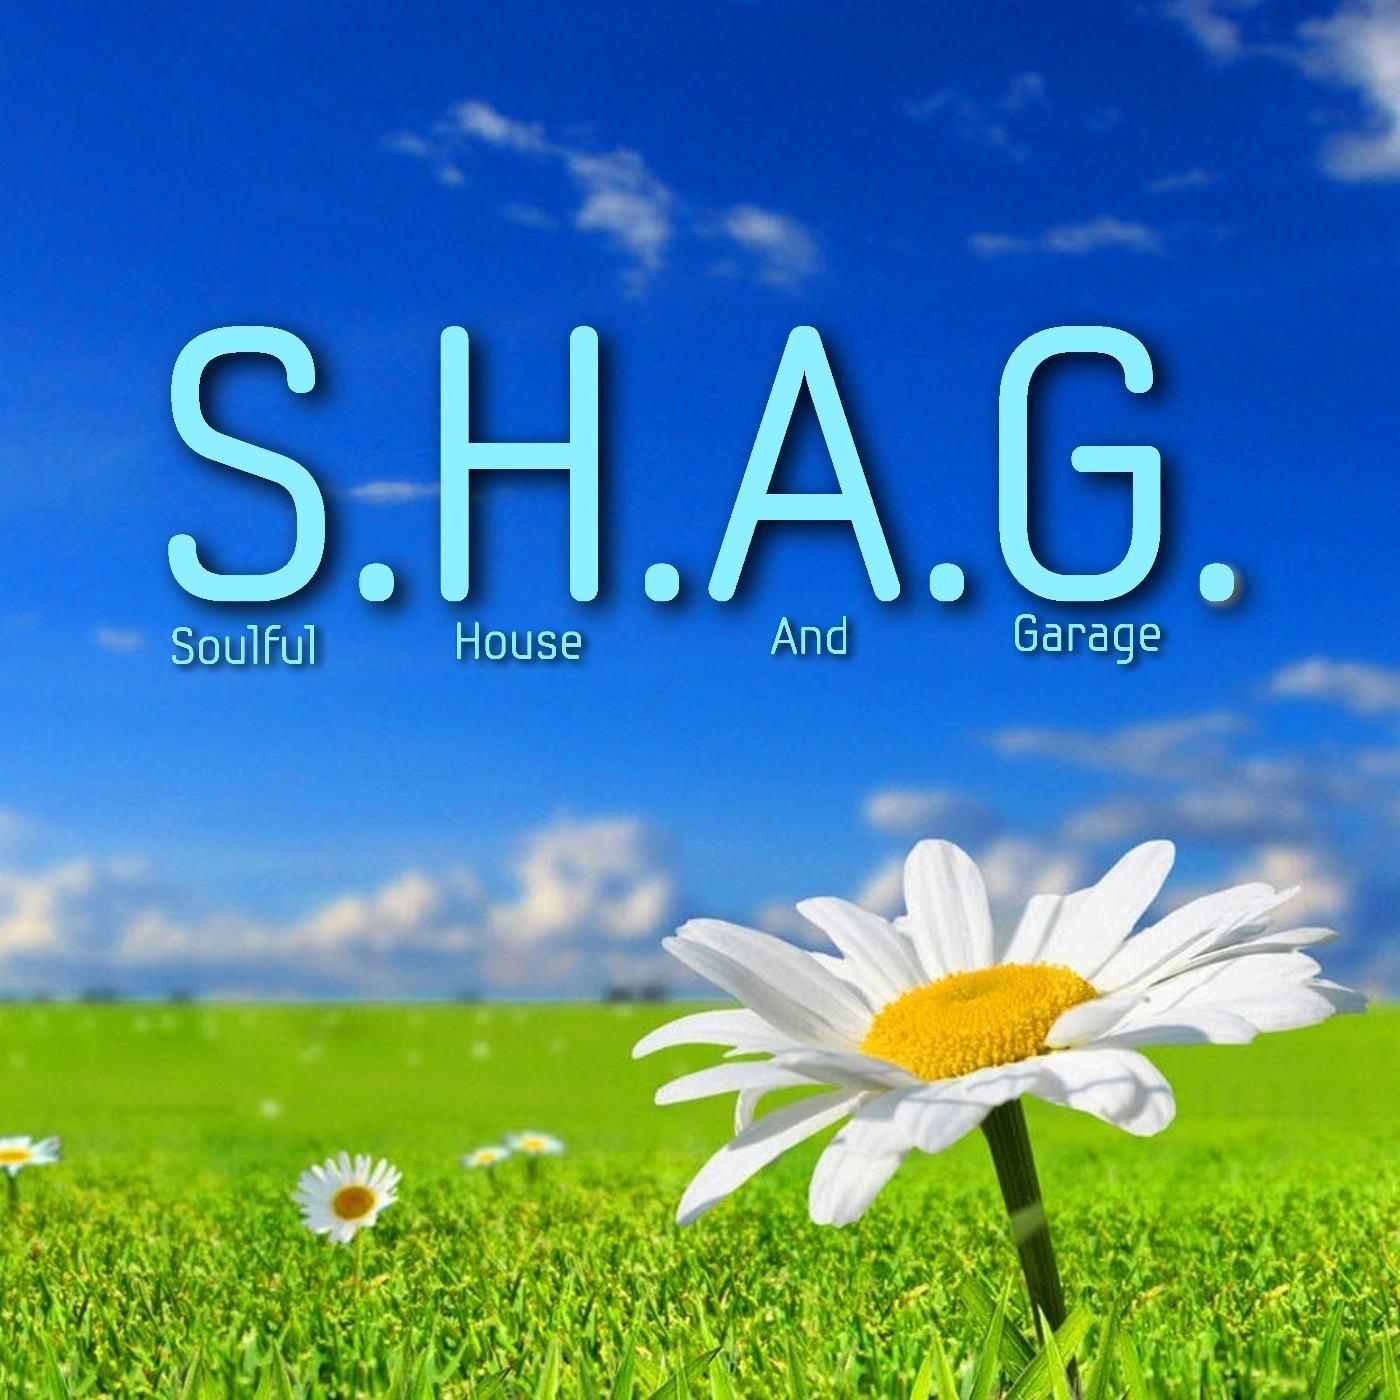 SHAG Soulful Afro House 19-mar-2018 DJP Pressure DJP's